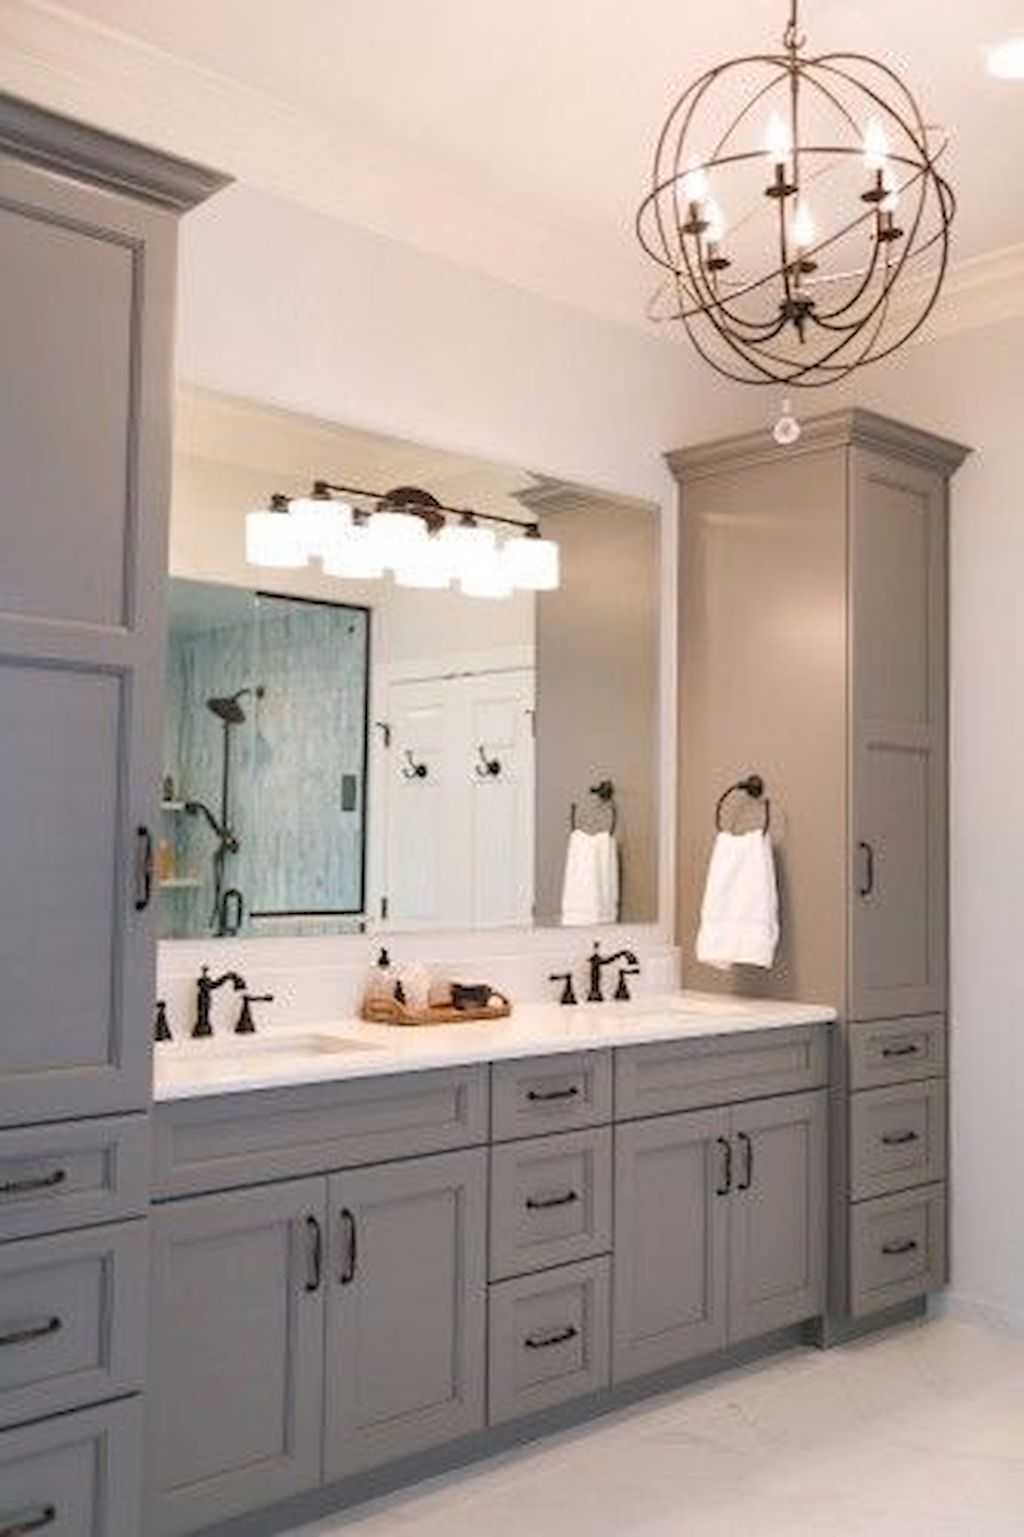 Adorable 90 Best Lamp For Farmhouse Bathroom Lighting Ideas Https Roomadness Com 2018 01 14 Bathroom Vanity Remodel Bathroom Vanity Designs Bathrooms Remodel [ 1537 x 1024 Pixel ]